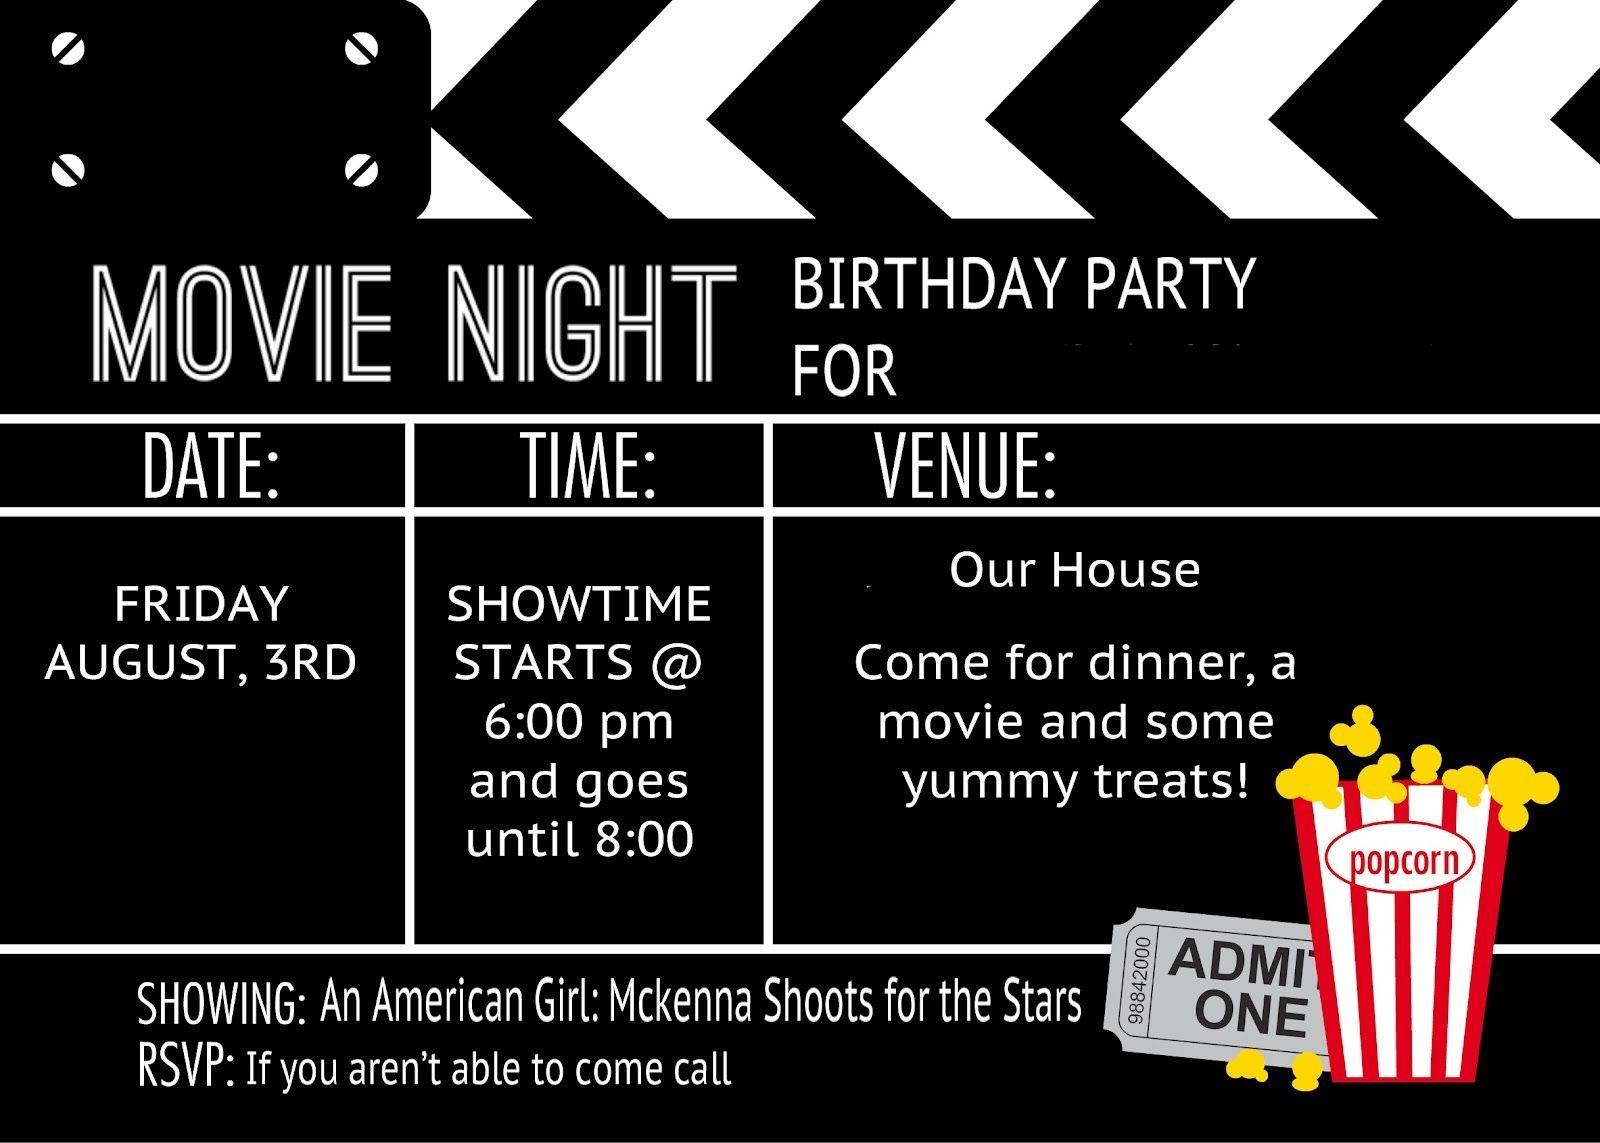 Birthday Party Invitation Templates Movie Theme | Kalli's 13Th - Movie Birthday Party Invitations Free Printable